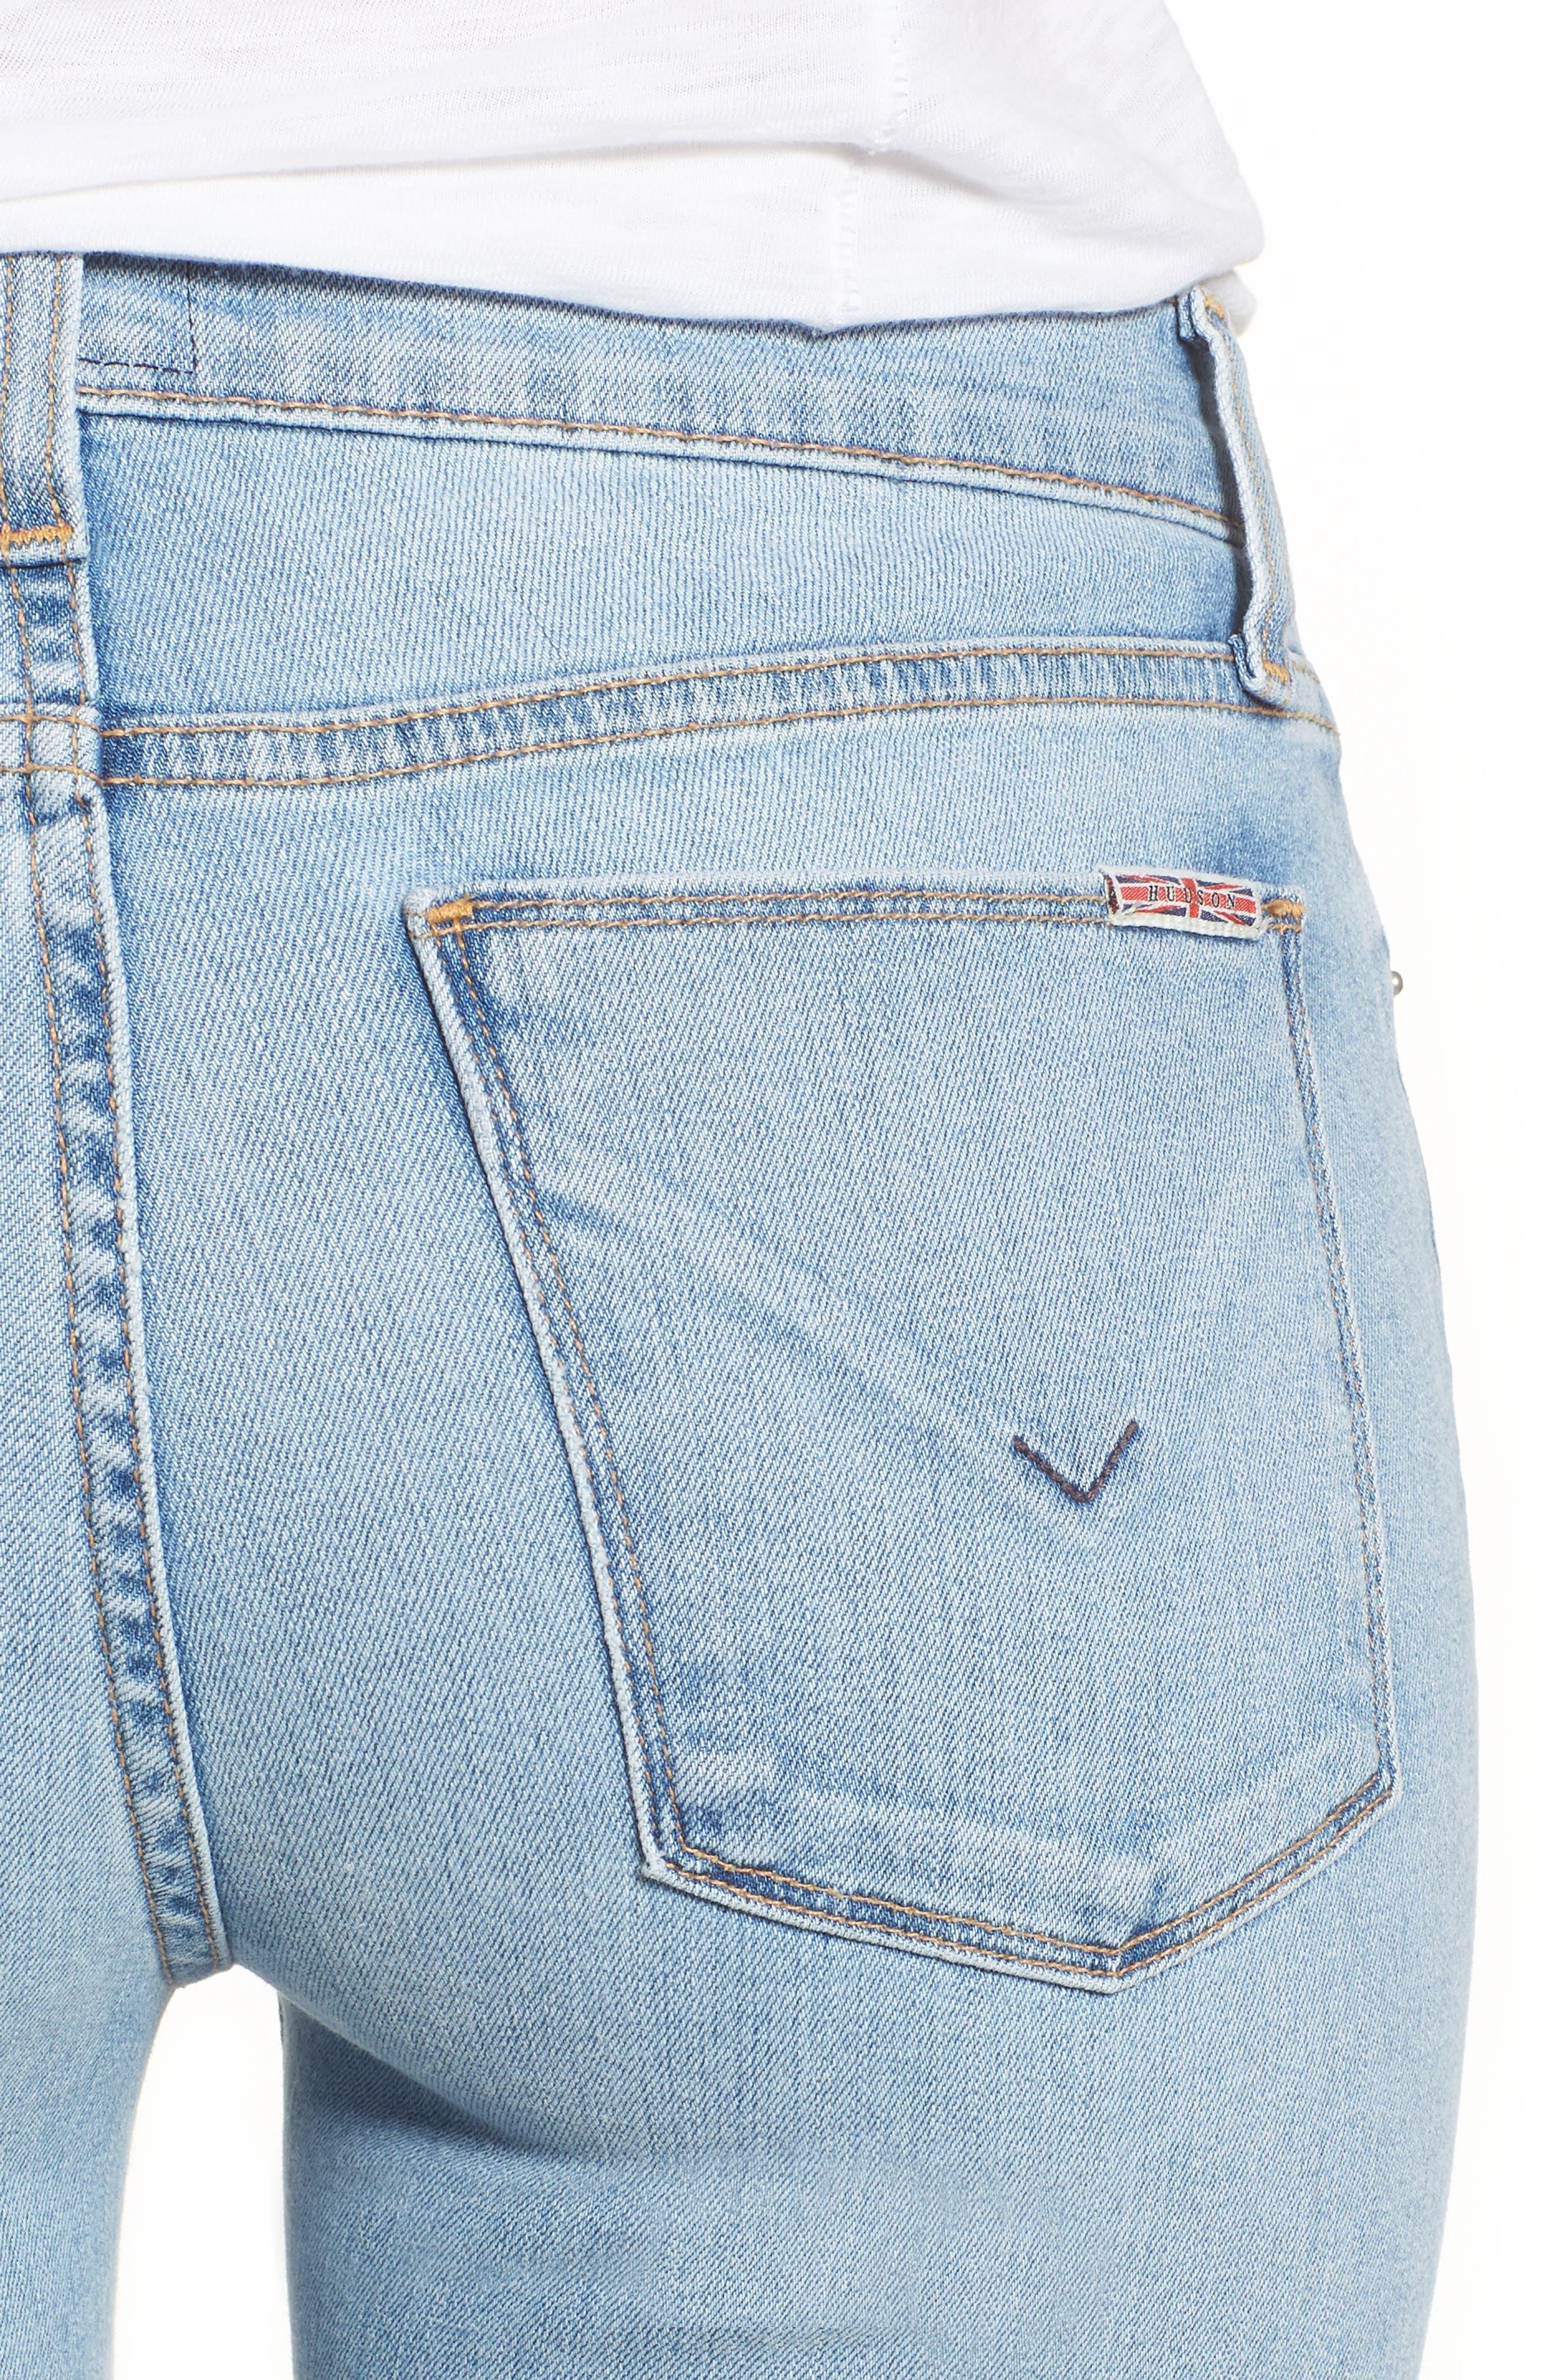 Tally Cuffed Crop Skinny Jeans,                             Alternate thumbnail 4, color,                             Gemini